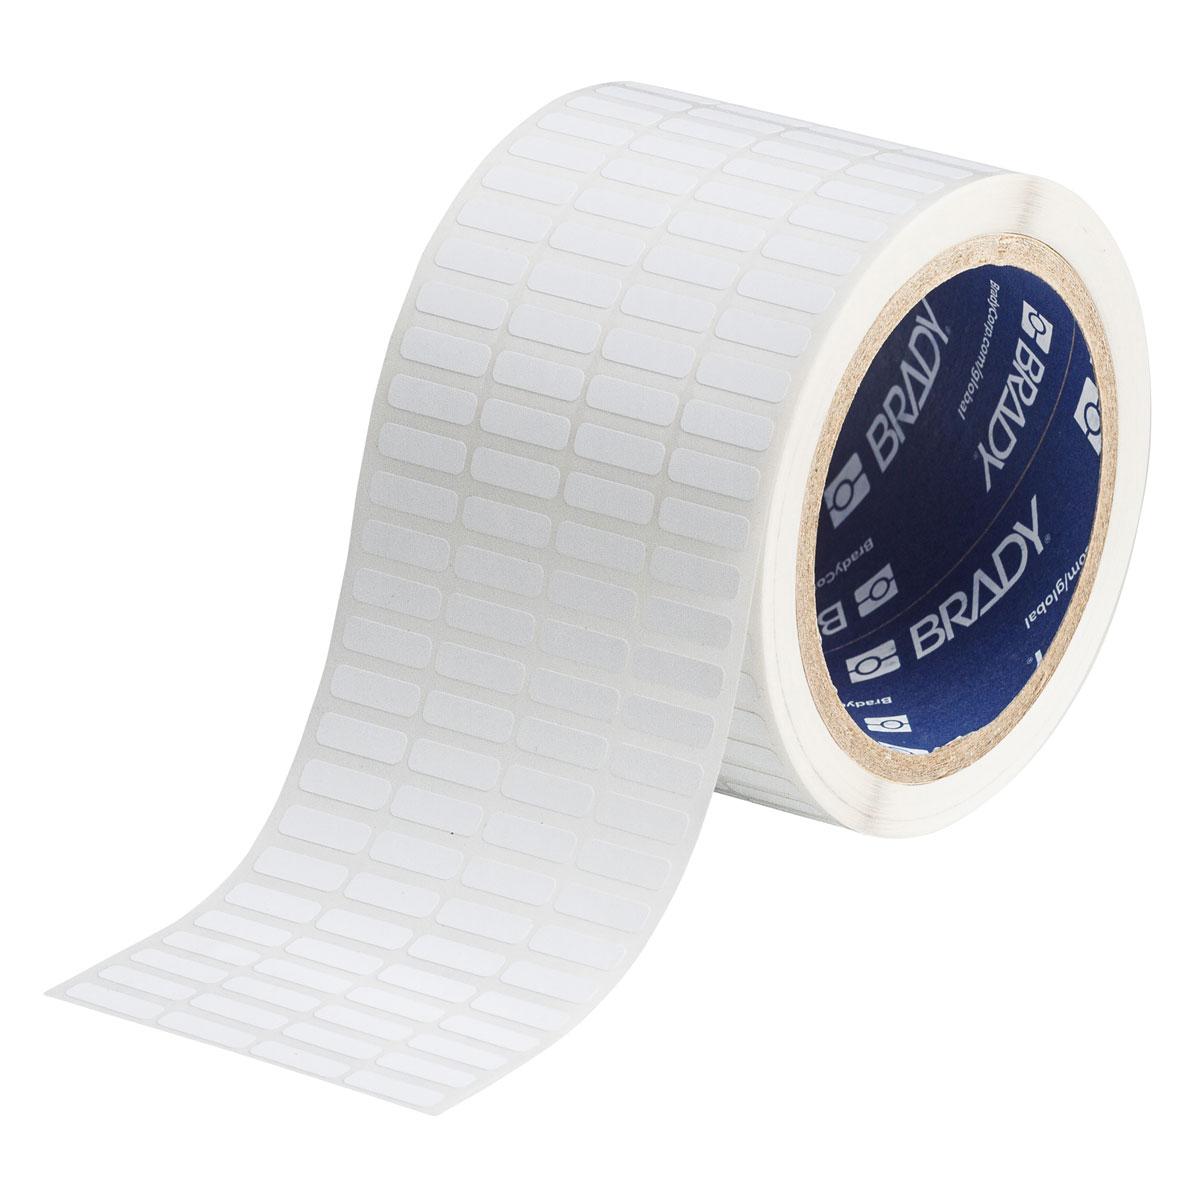 Brady THT-14-351-10 0.65 Width x 0.2 Height 10000 per Roll Matte Finish White Thermal Transfer Printable Labels Brady Worldwide Inc. B-351 Tamper-Resistant Vinyl